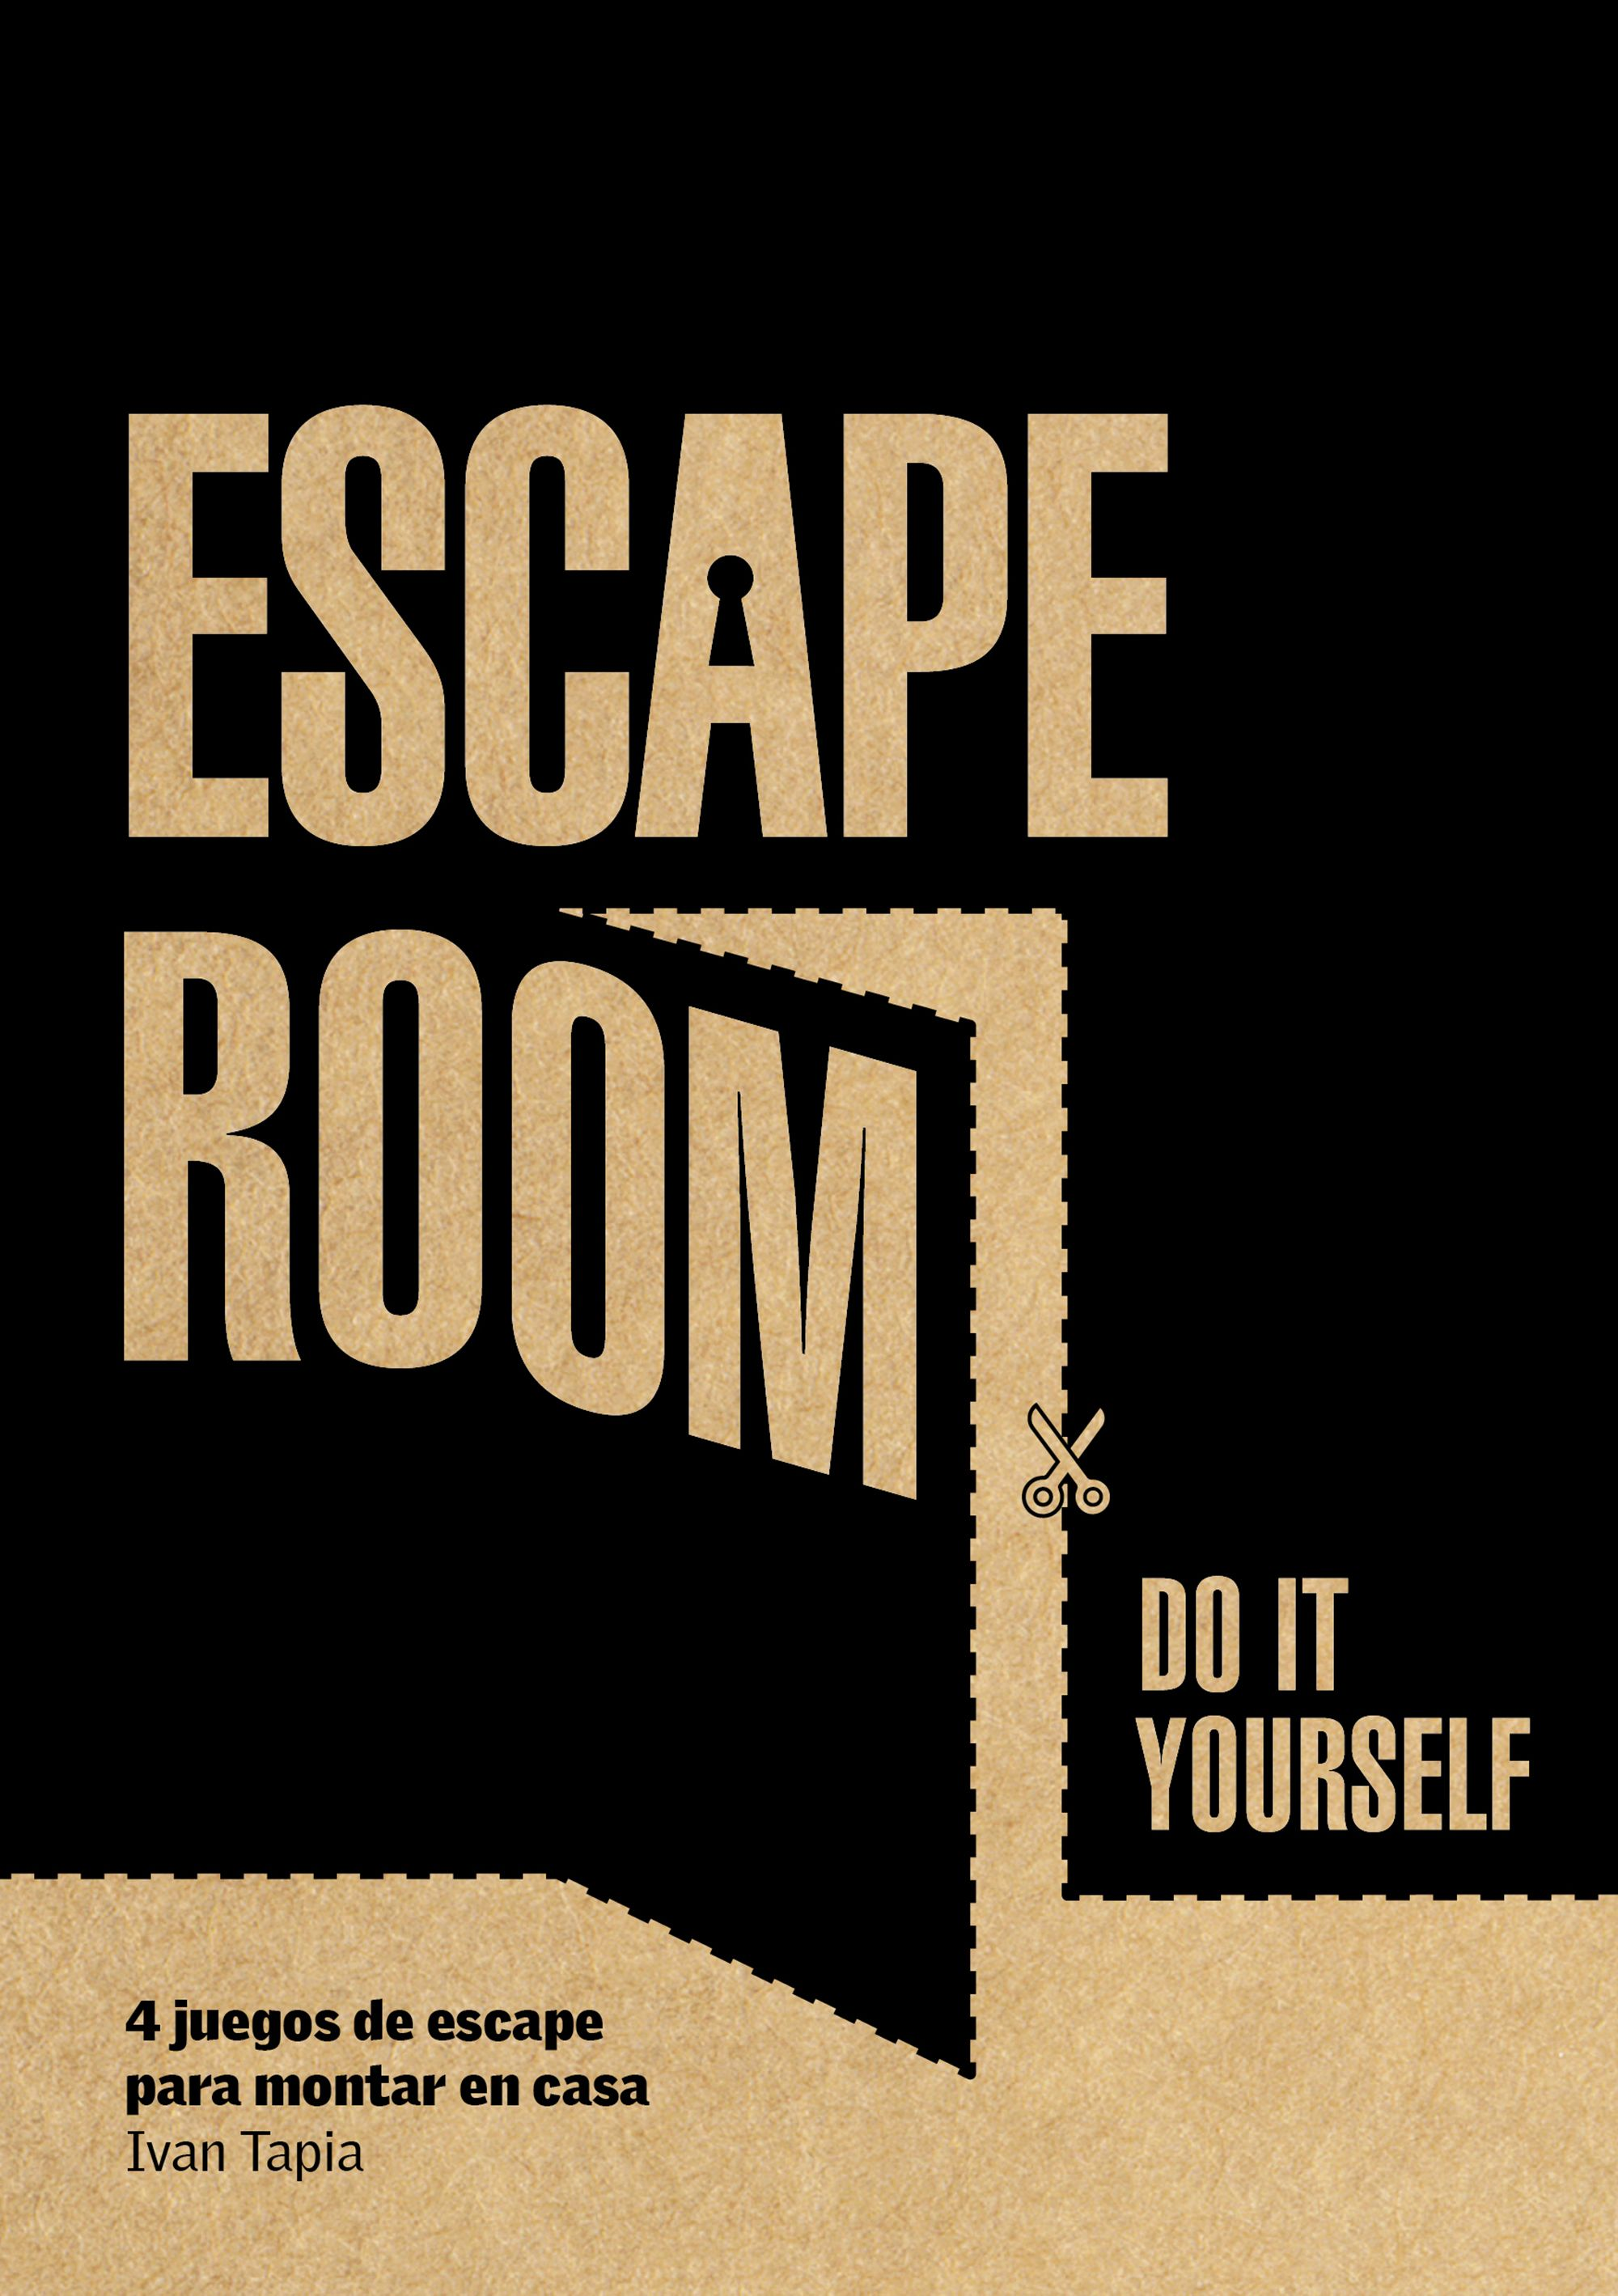 Escape room, do it yourself, de Ivan Tapia